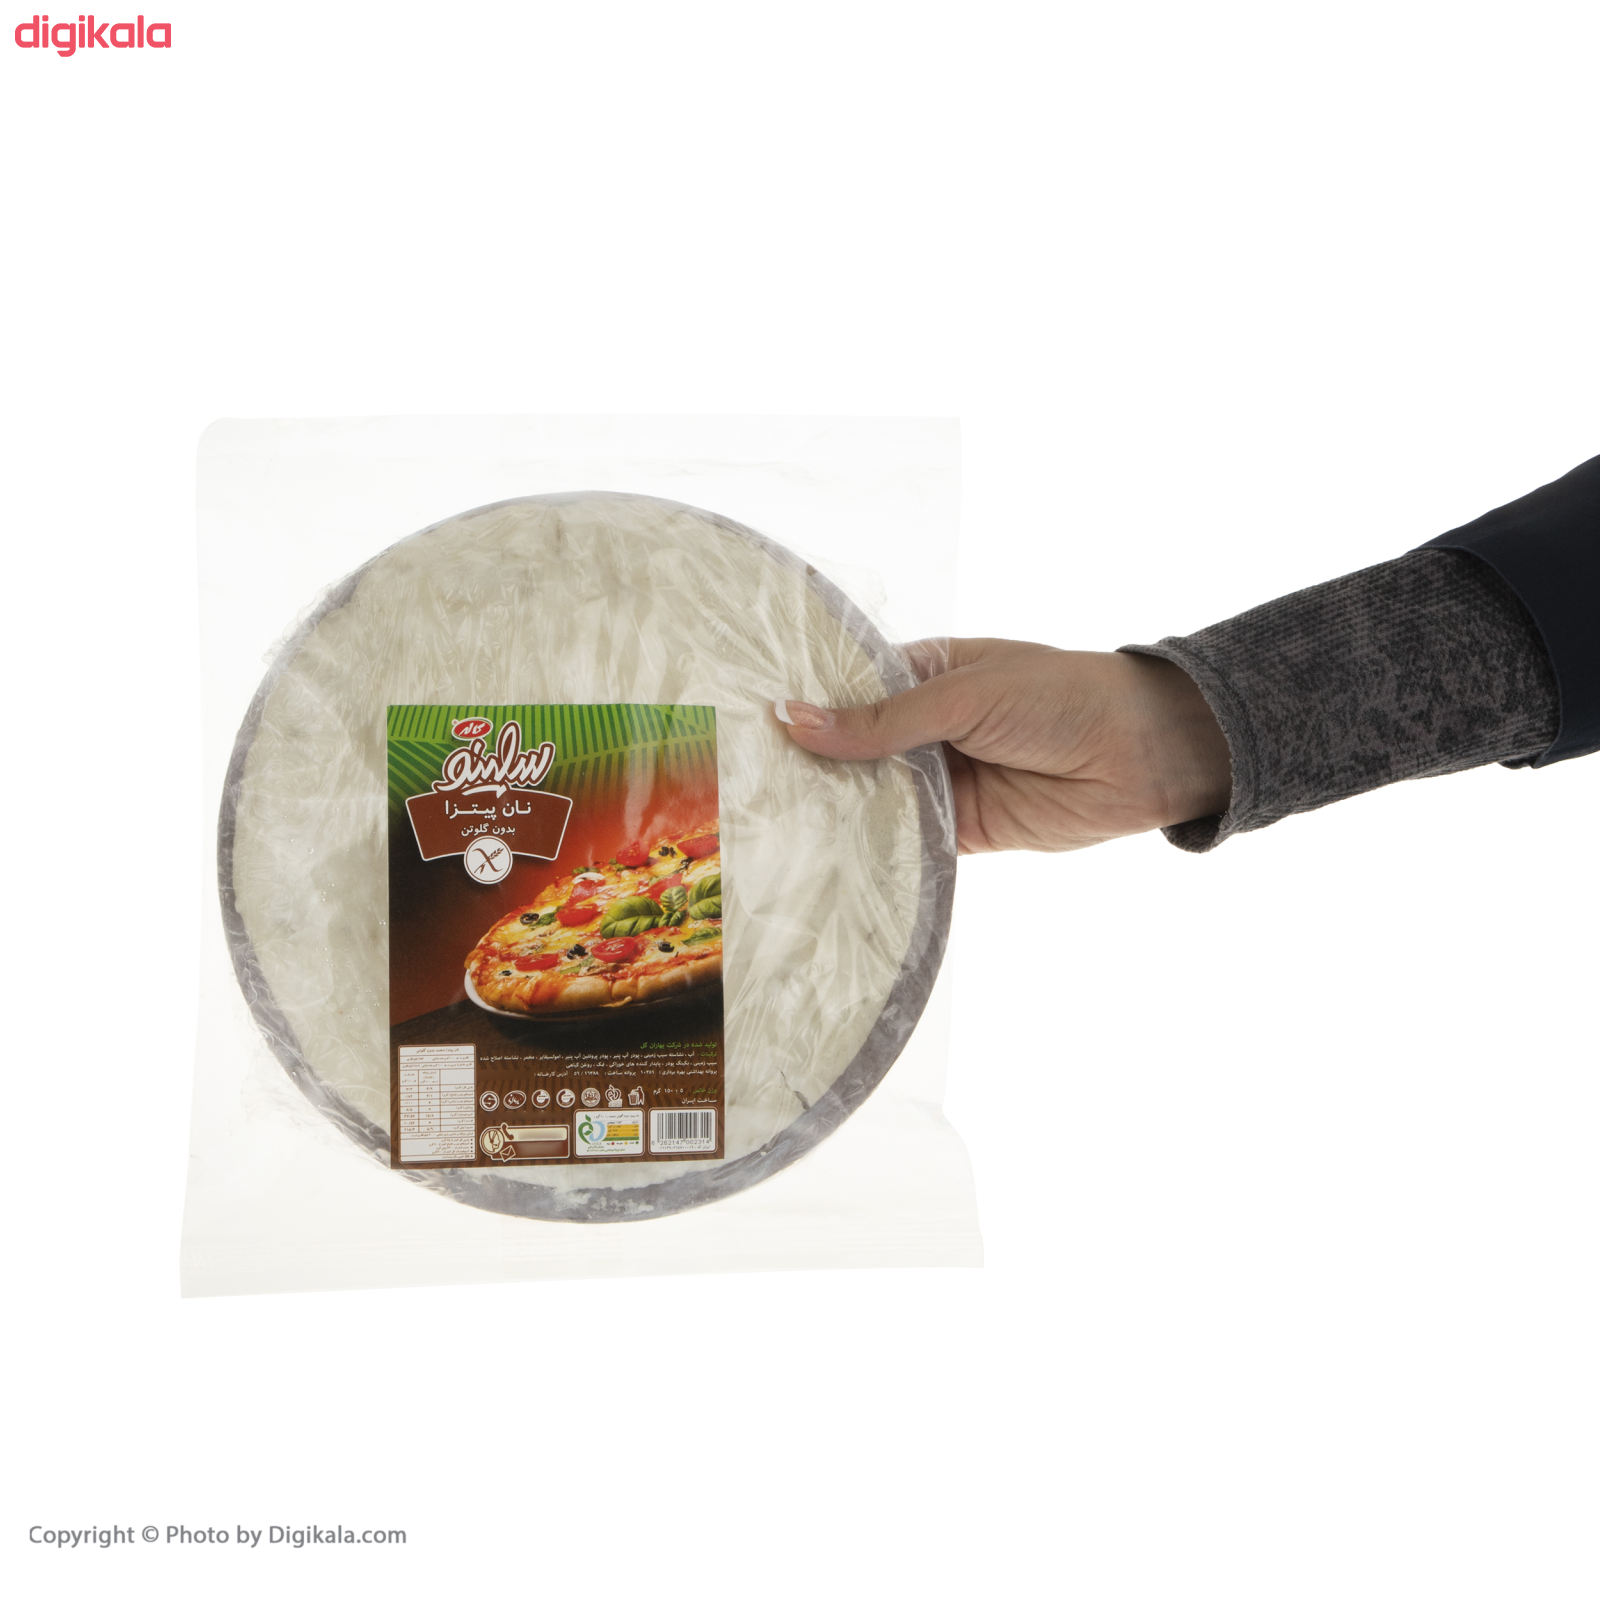 نان پیتزا بدون گلوتن سلینو - 150 گرم  main 1 4